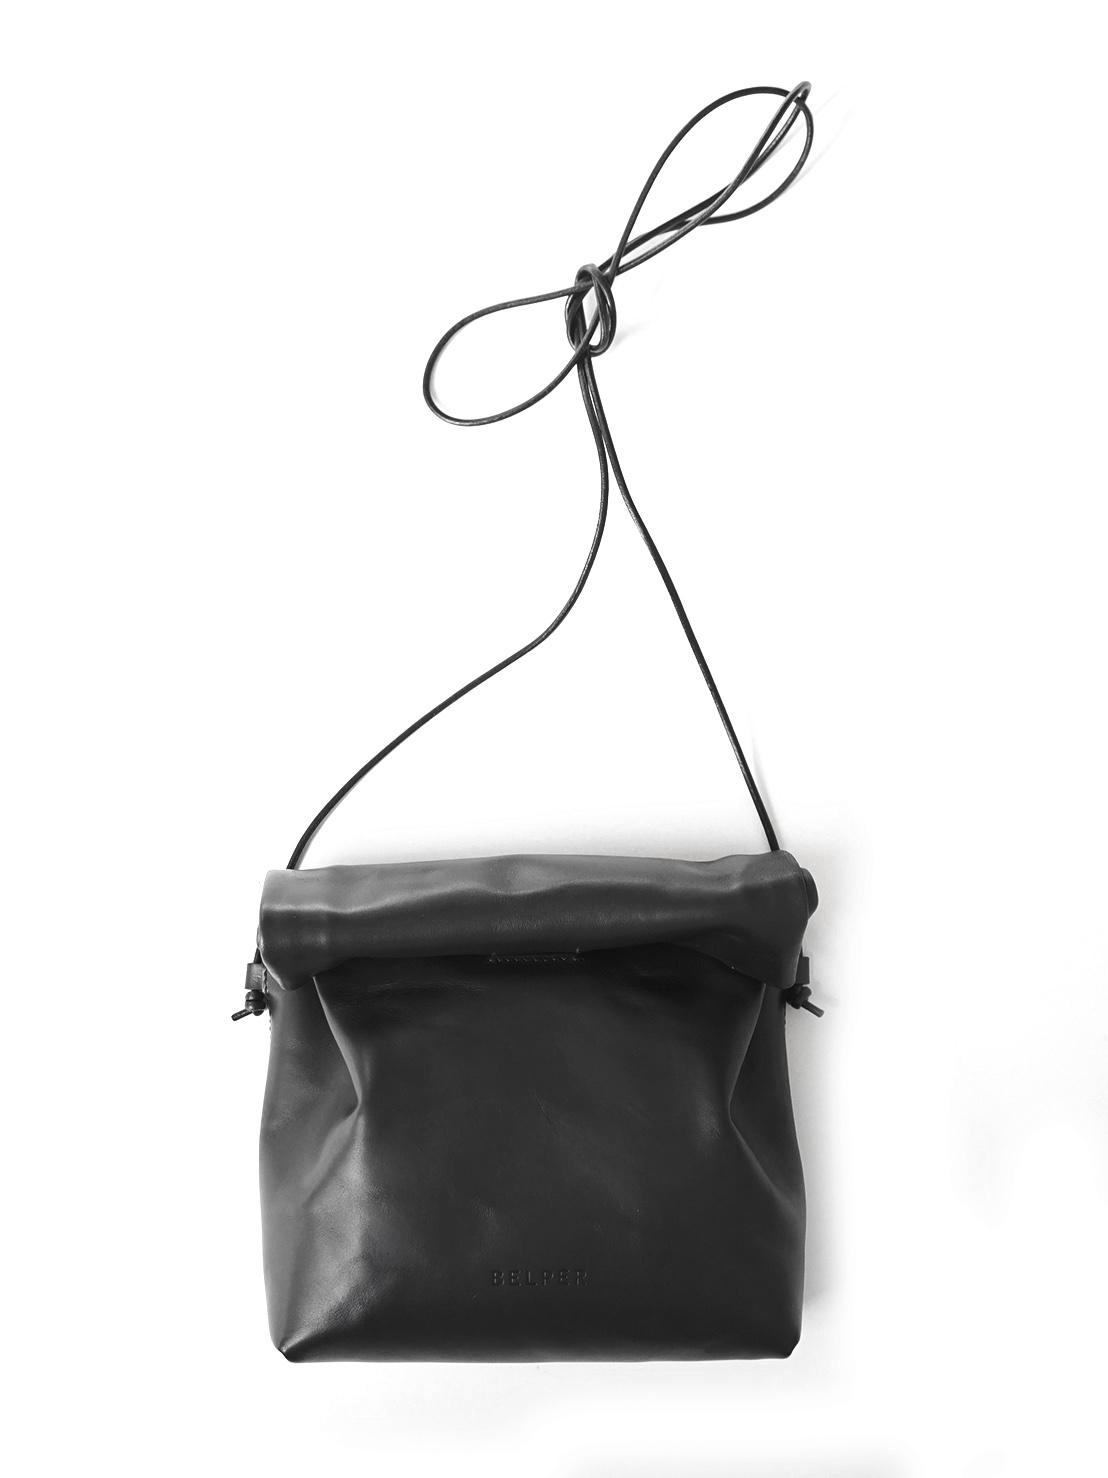 BELPER / WALK AROUND BAG